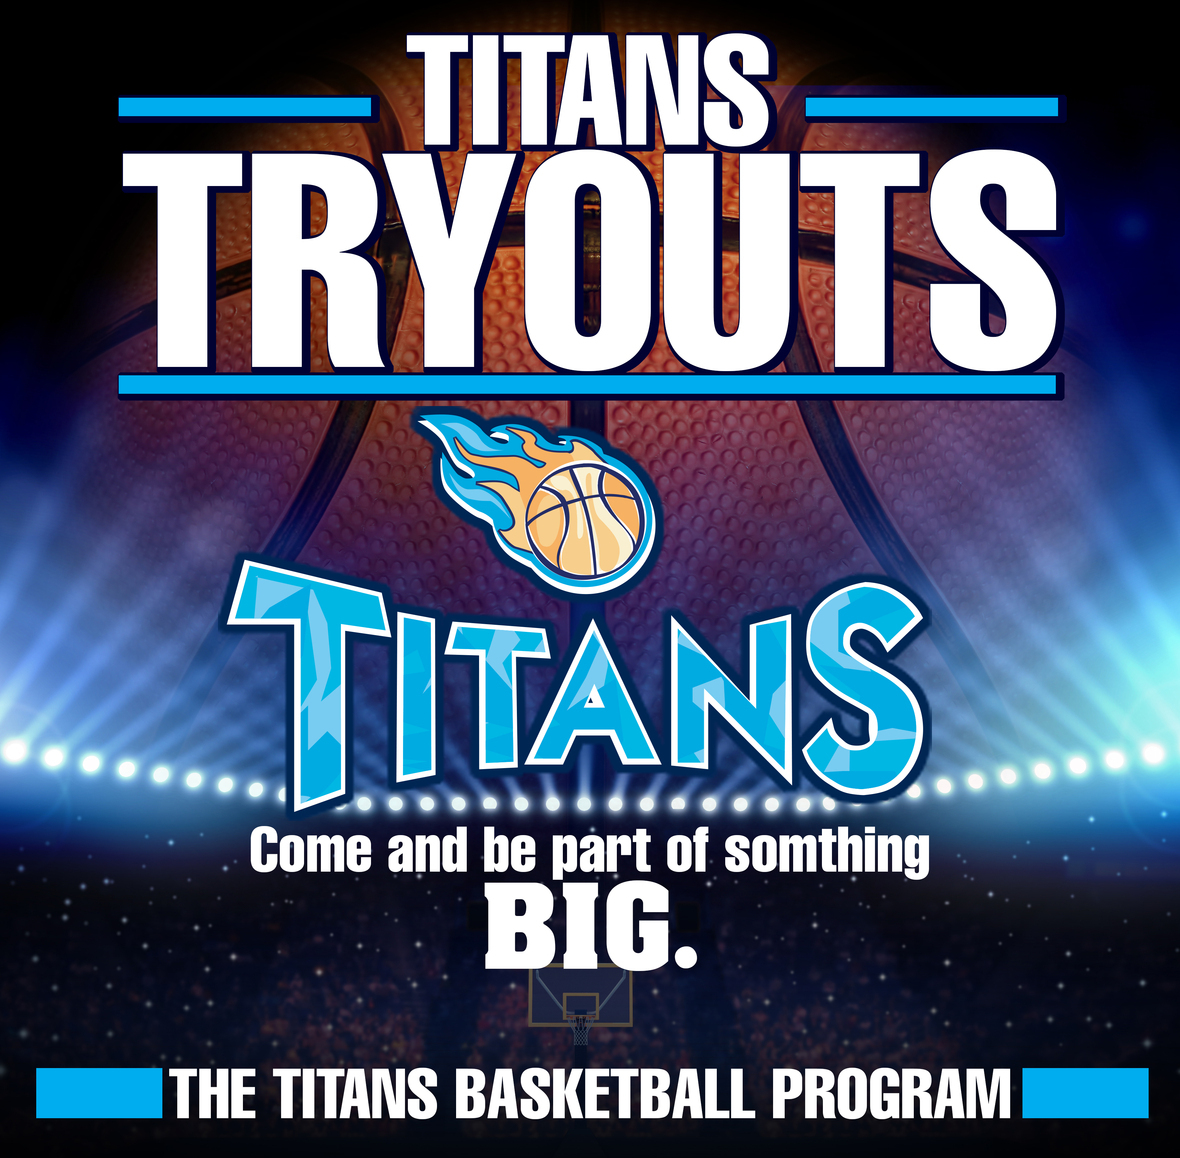 Titans-Bright-Basketball-lights